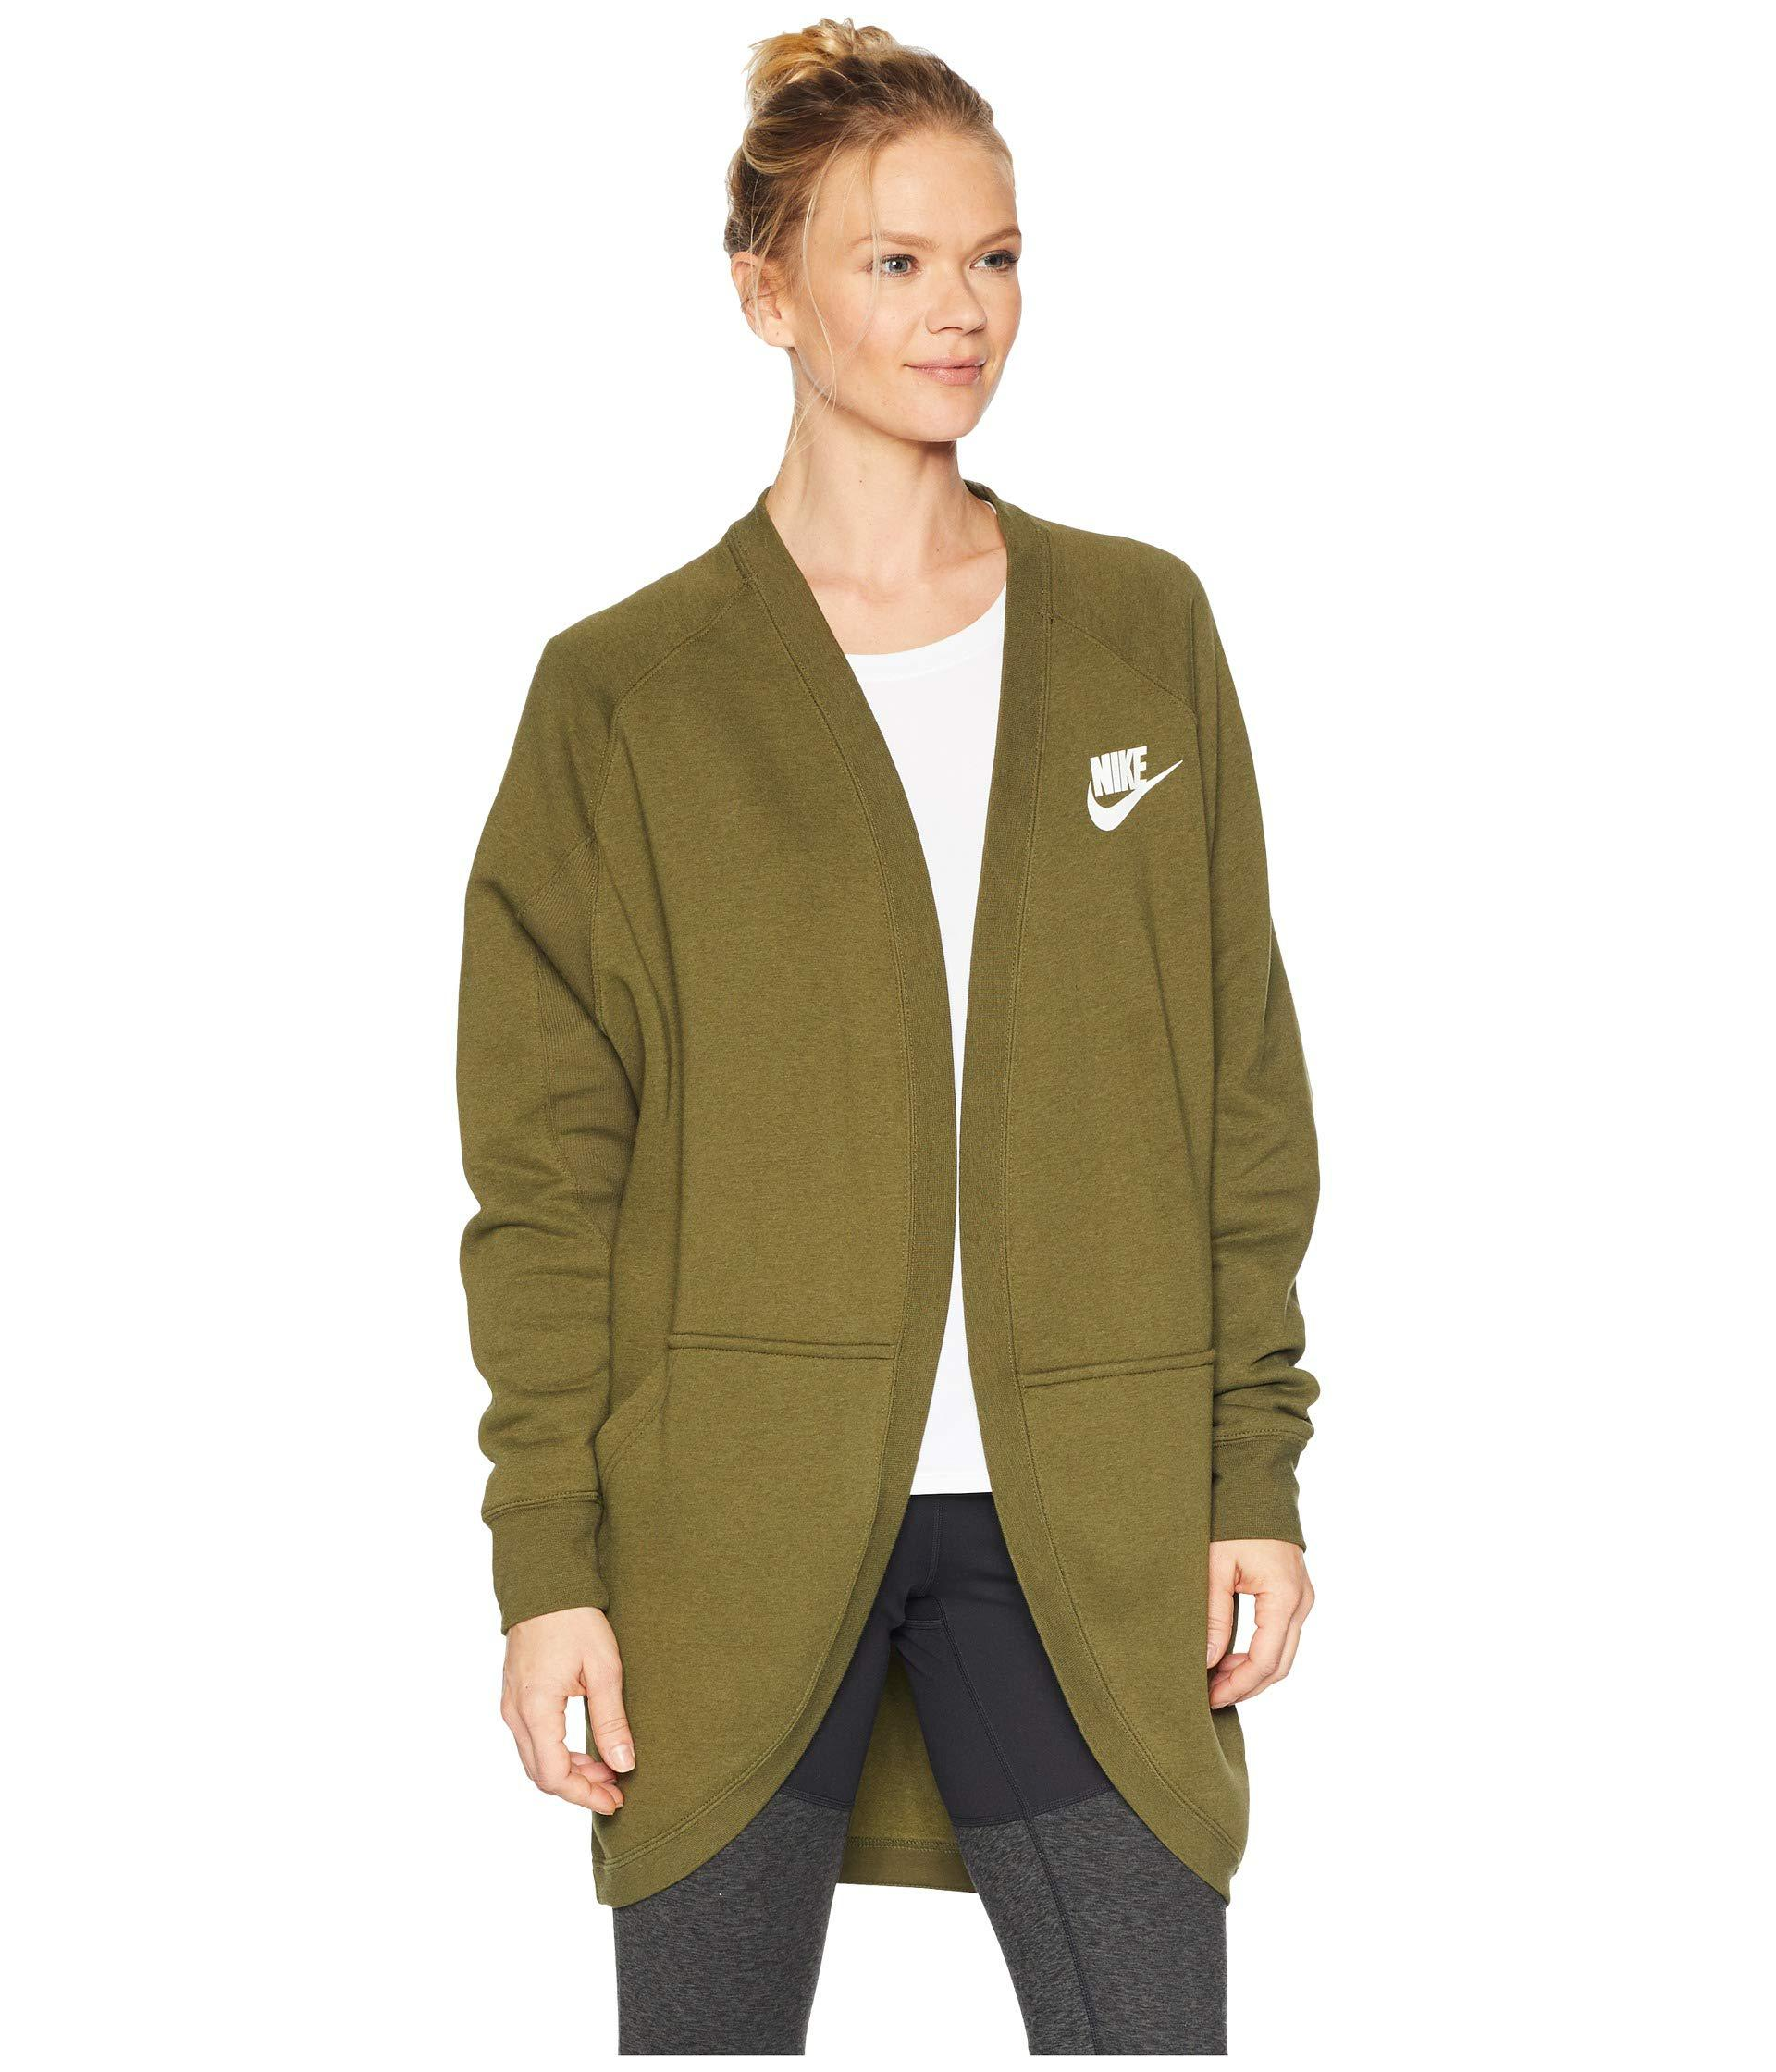 Nike Cotton Rally Rib Cardigan Grey Heather Pale Grey